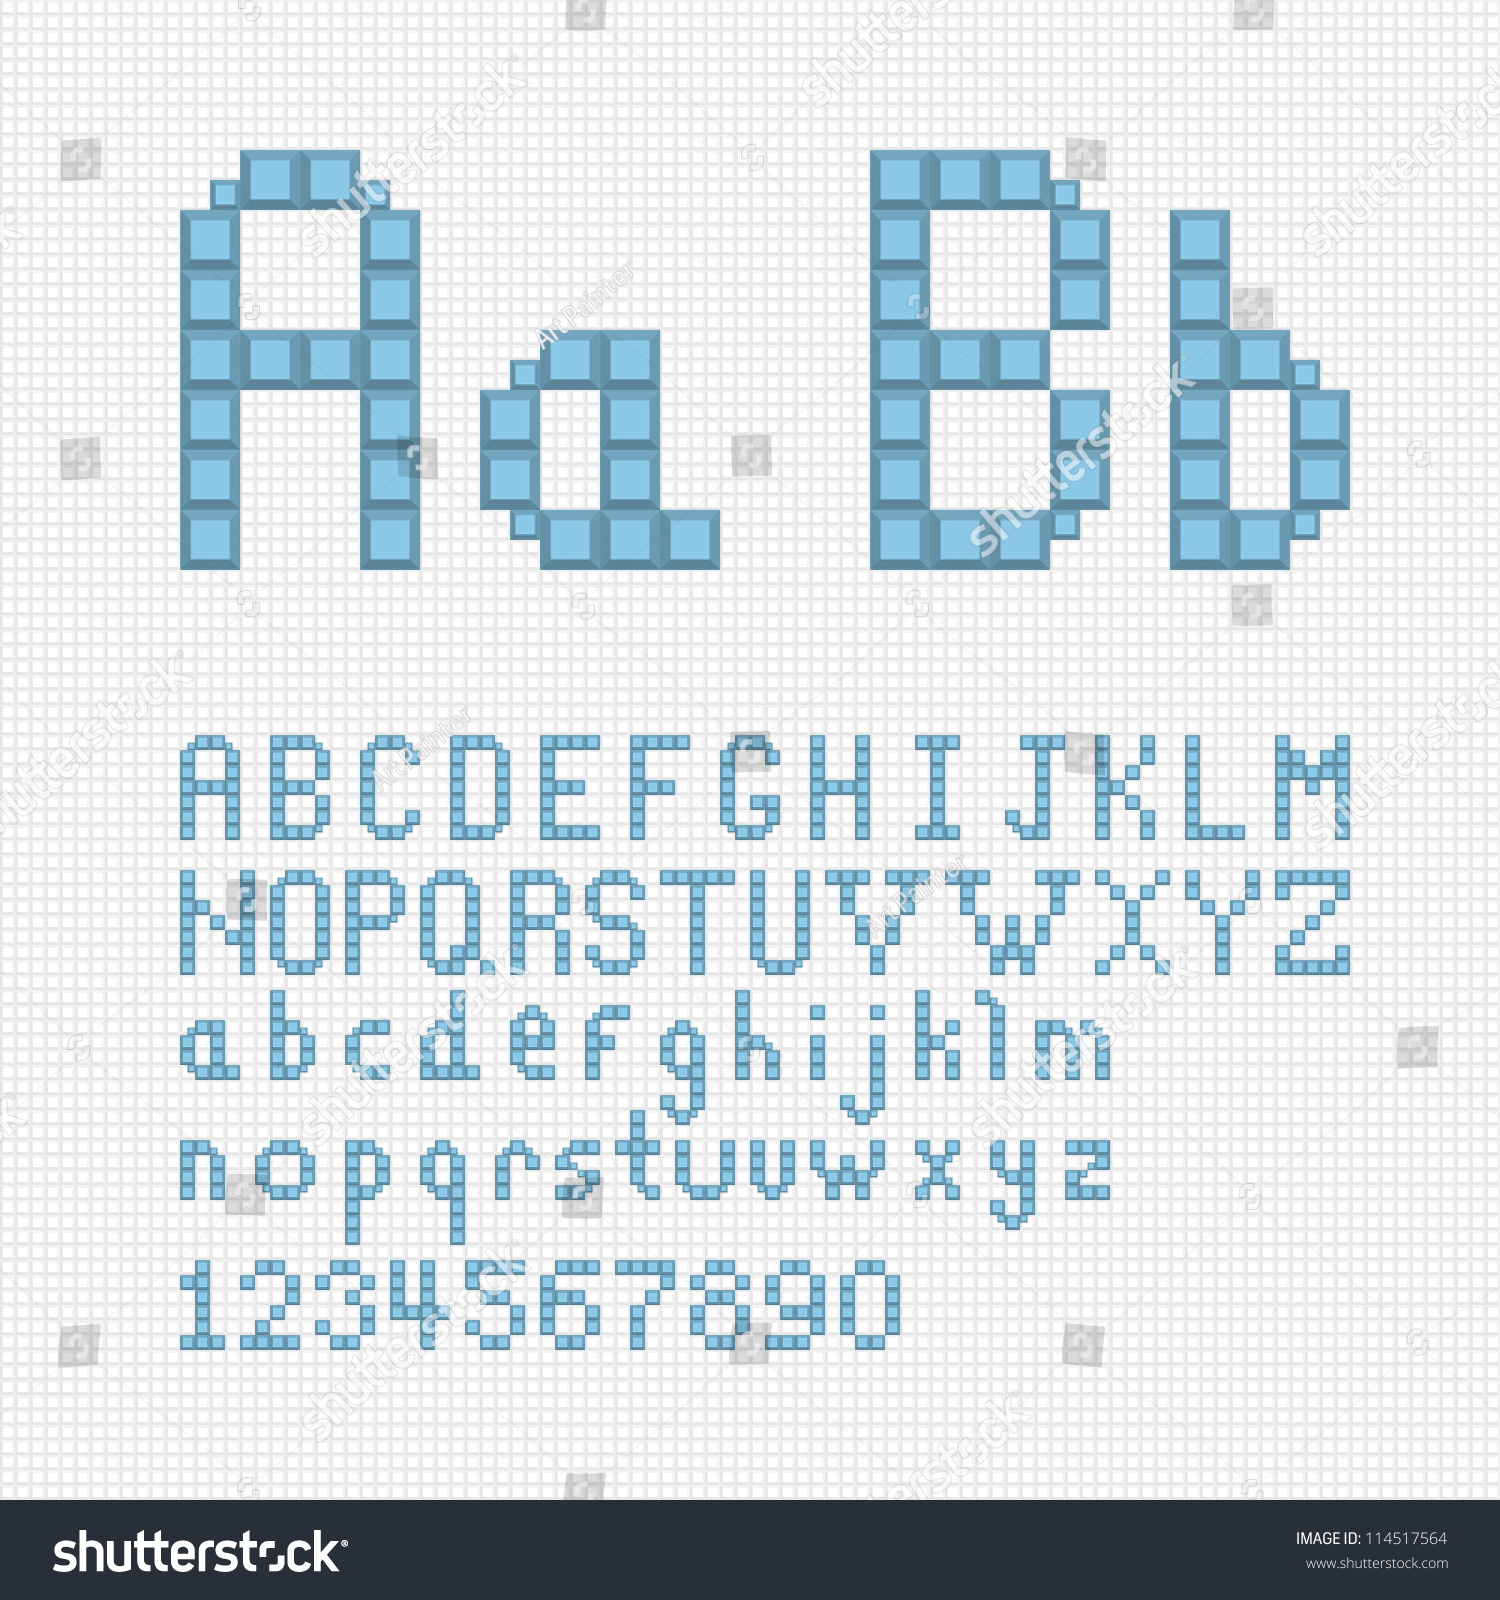 Vector Alphabet Set Pixel Art Style Stock Vector 114517564